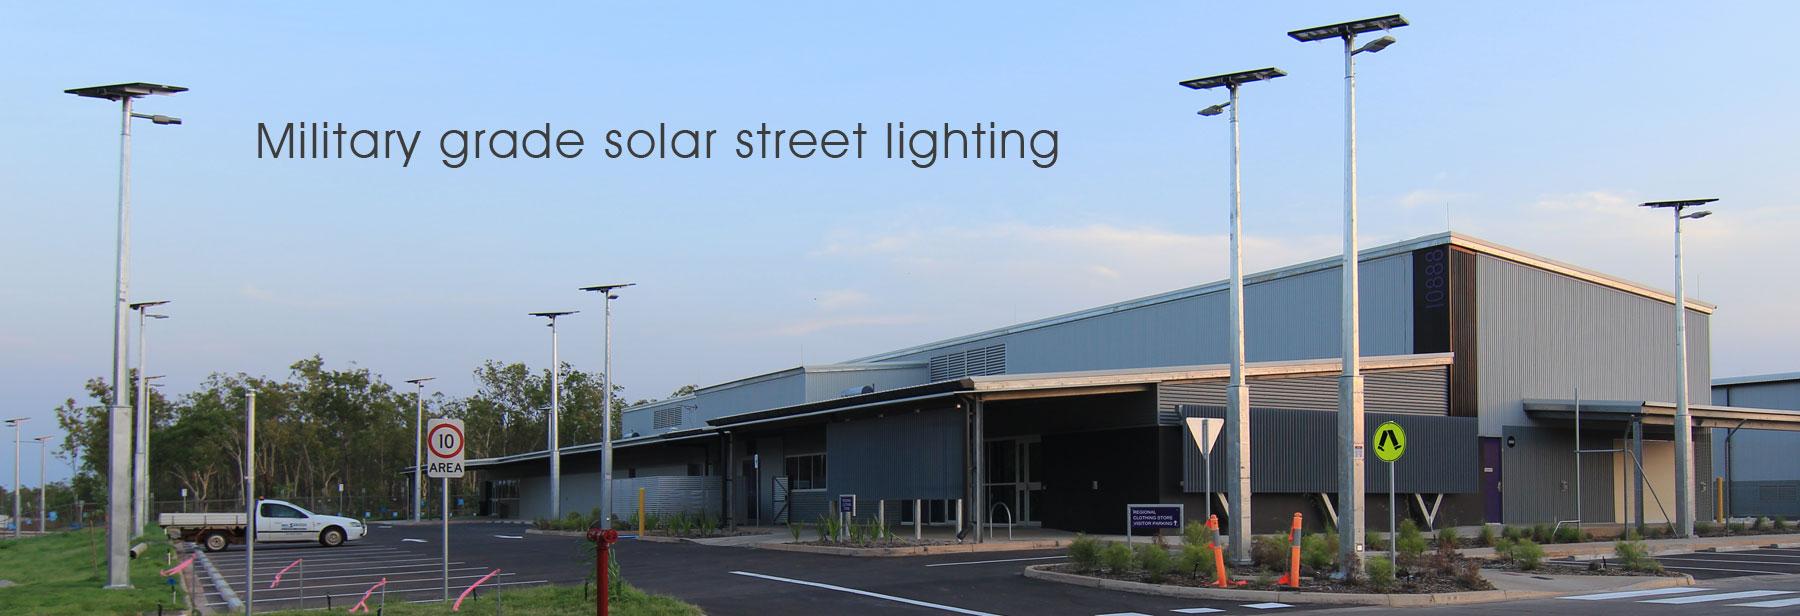 Military grade solar street lighting